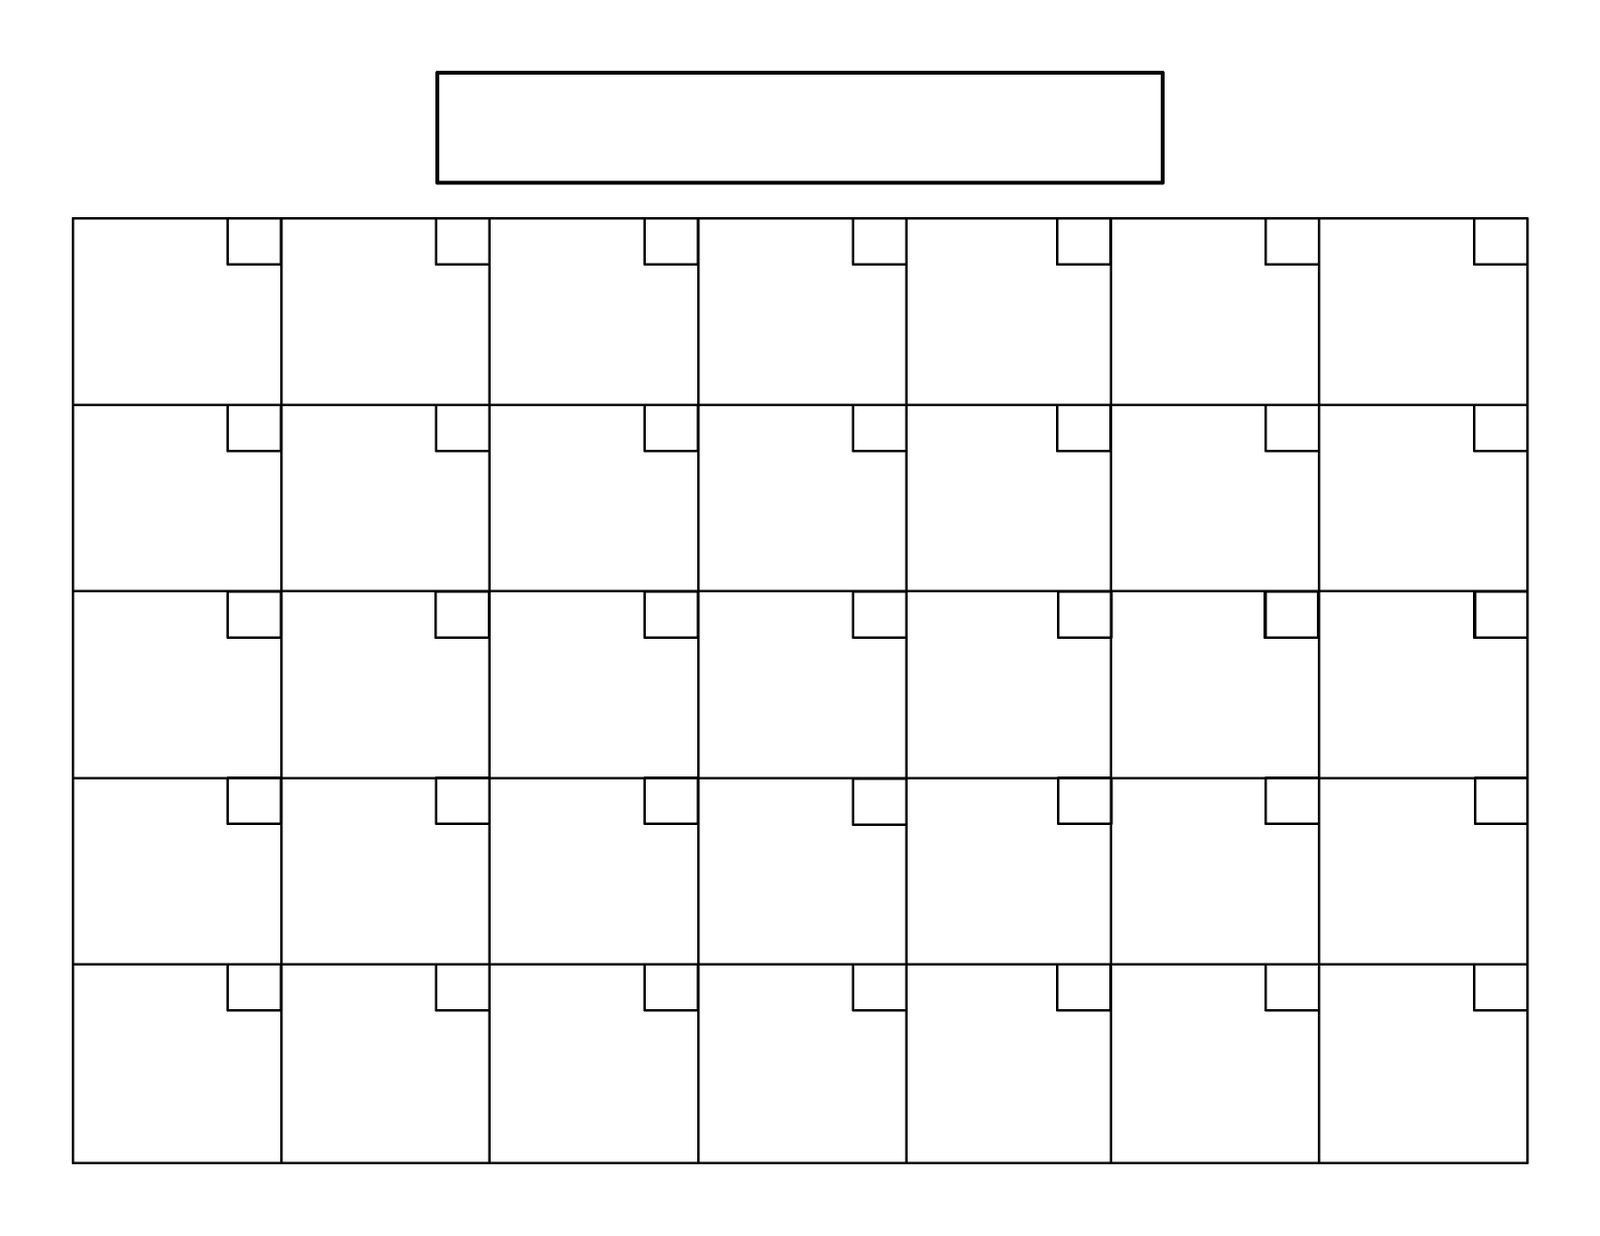 Remarkable Blank Calendar 31 Days • Printable Blank Calendar-A Blank Page Of 31 Days Of A Calendar